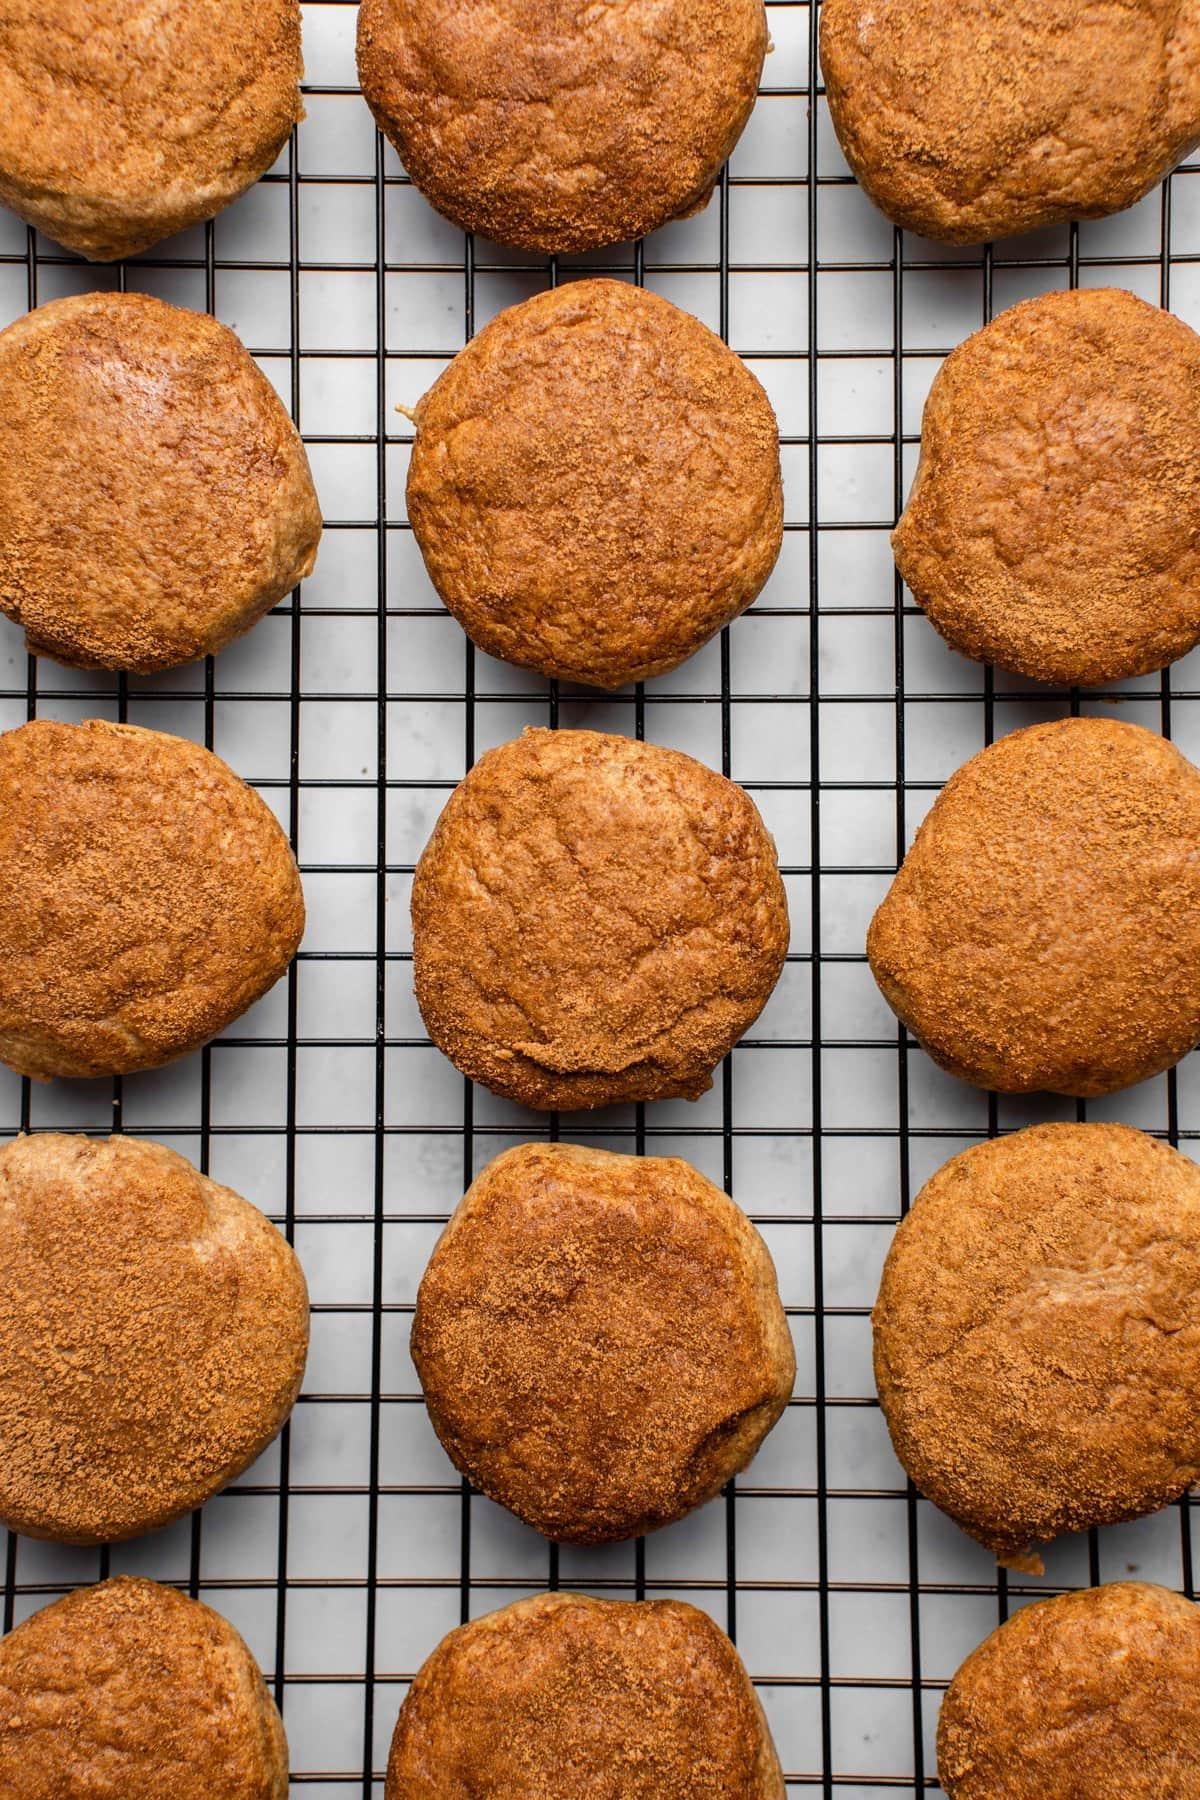 cashew butter snickerdoodle cookies cooling on black metal baking rack